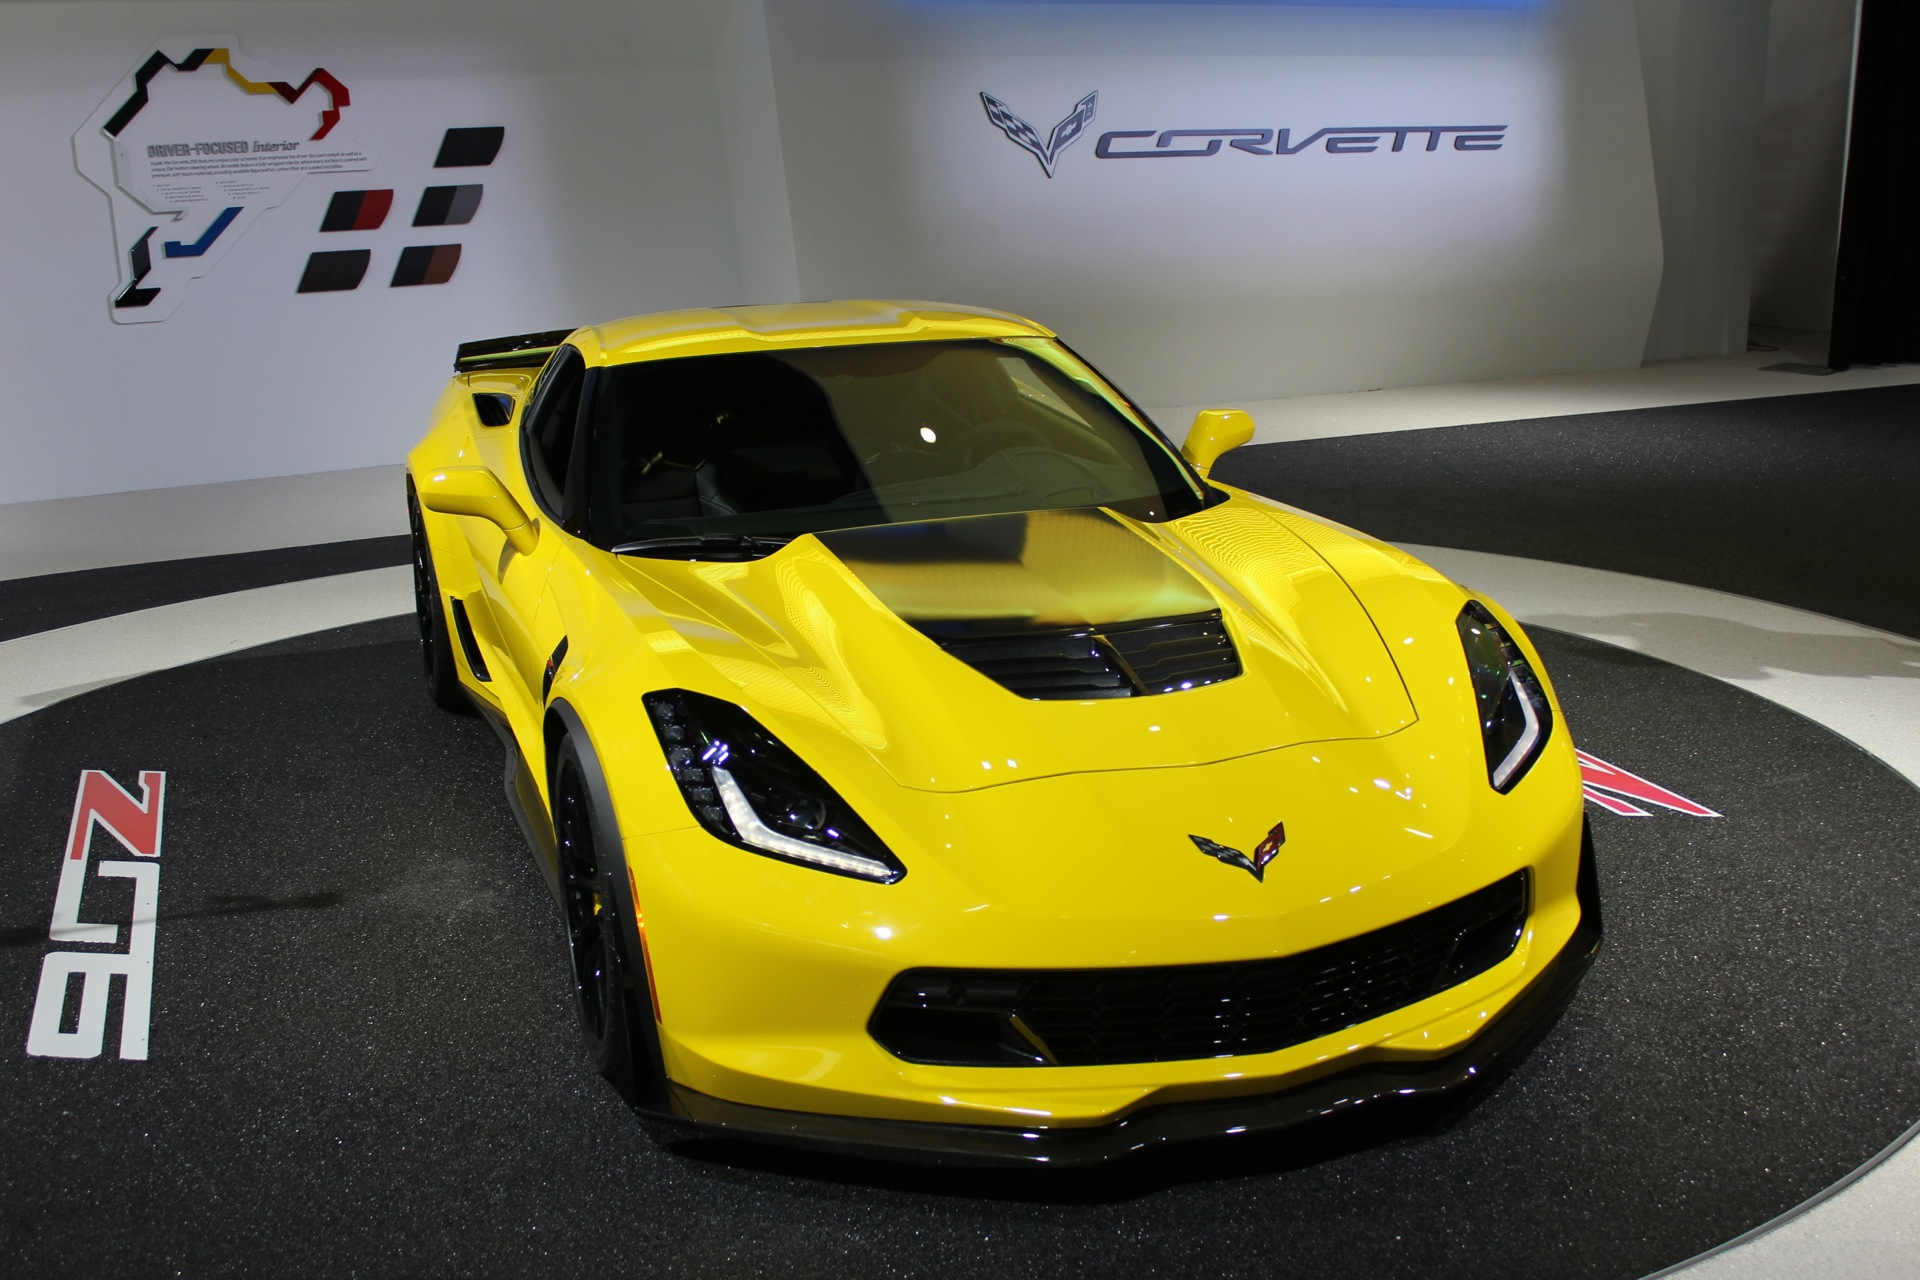 2015 Chevrolet Corvette Z06 Video Preview